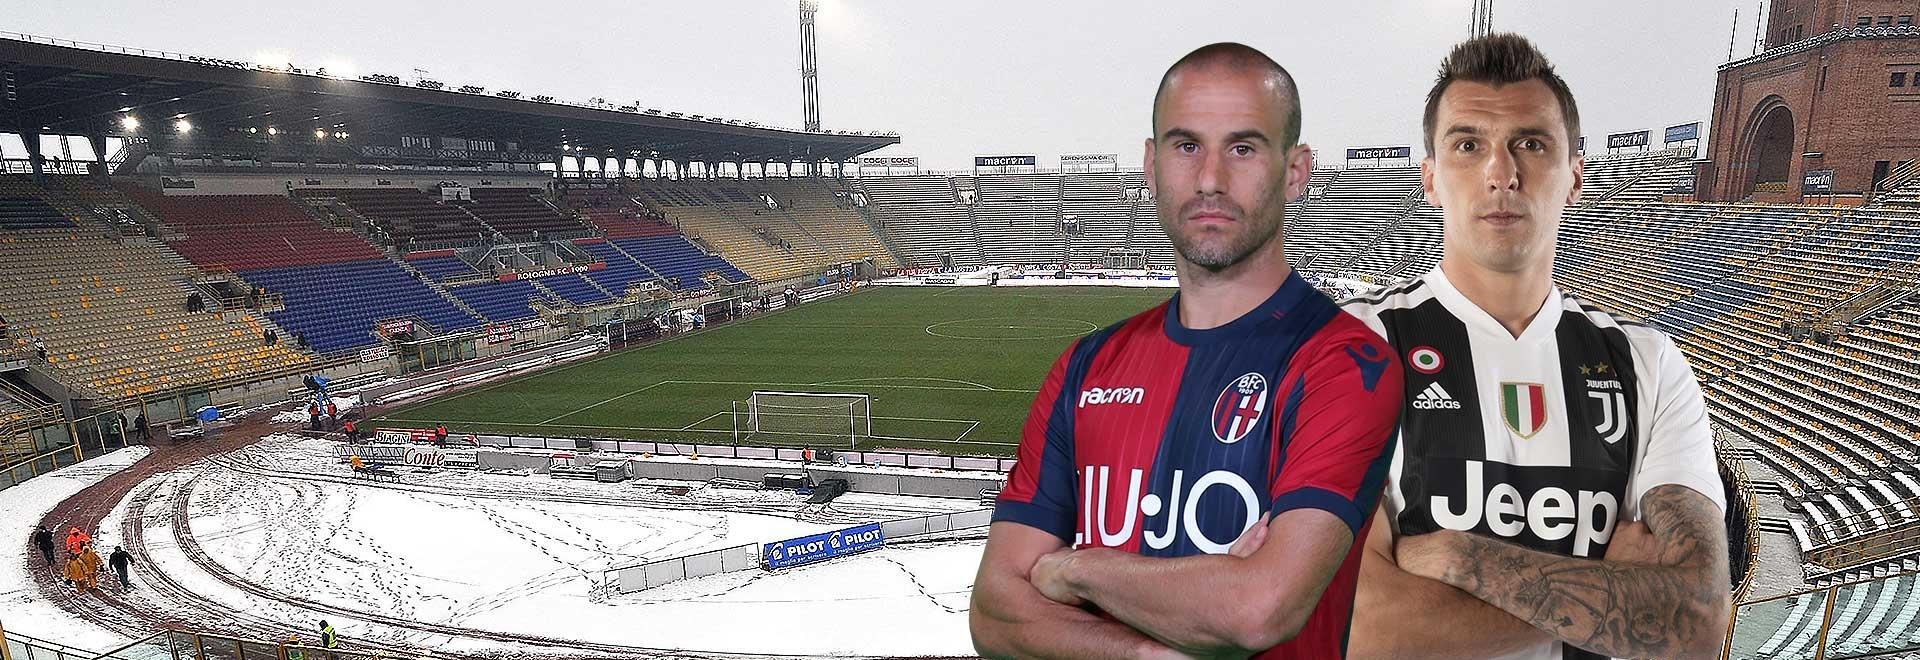 Bologna - Juventus. 25a g.